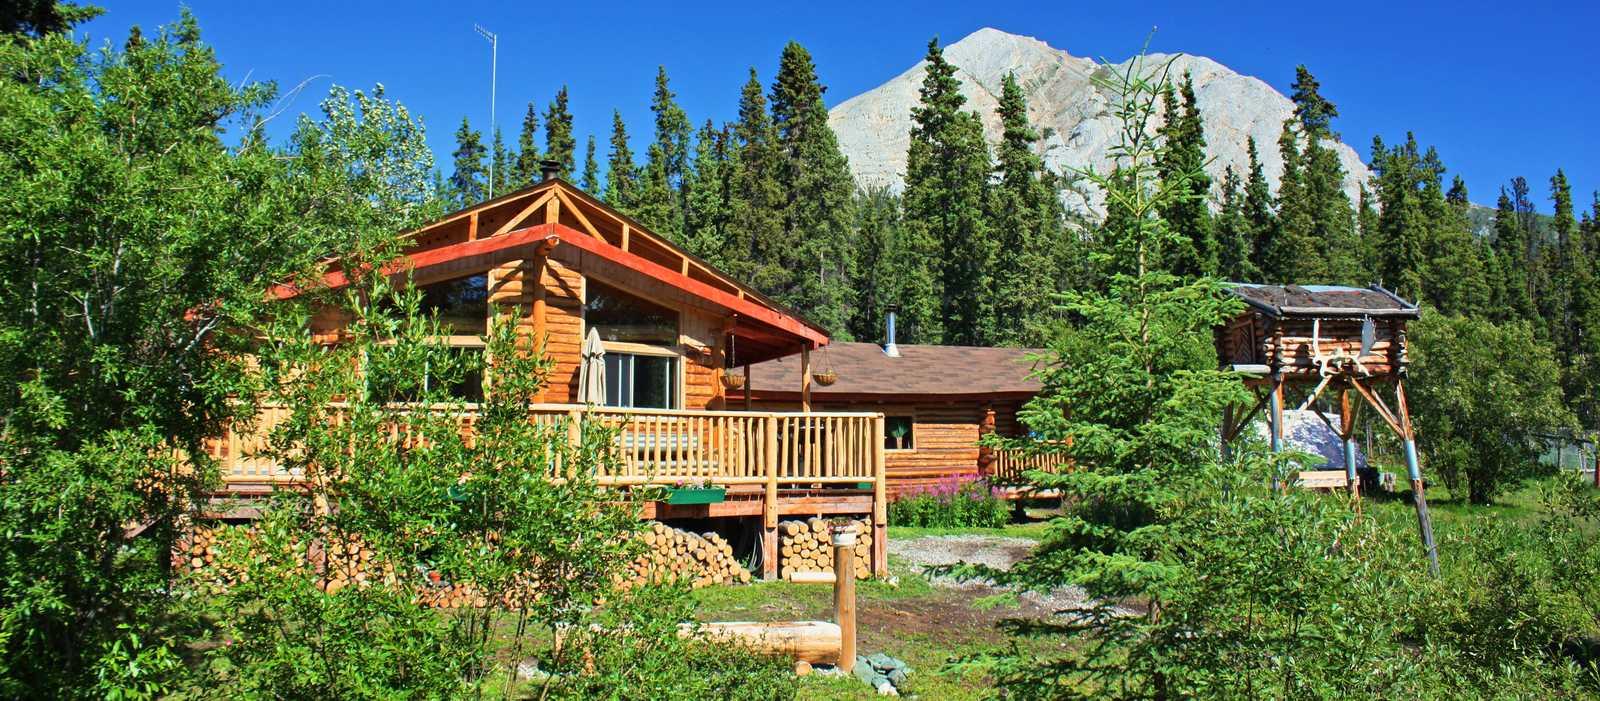 Tagish Wilderness Lodge